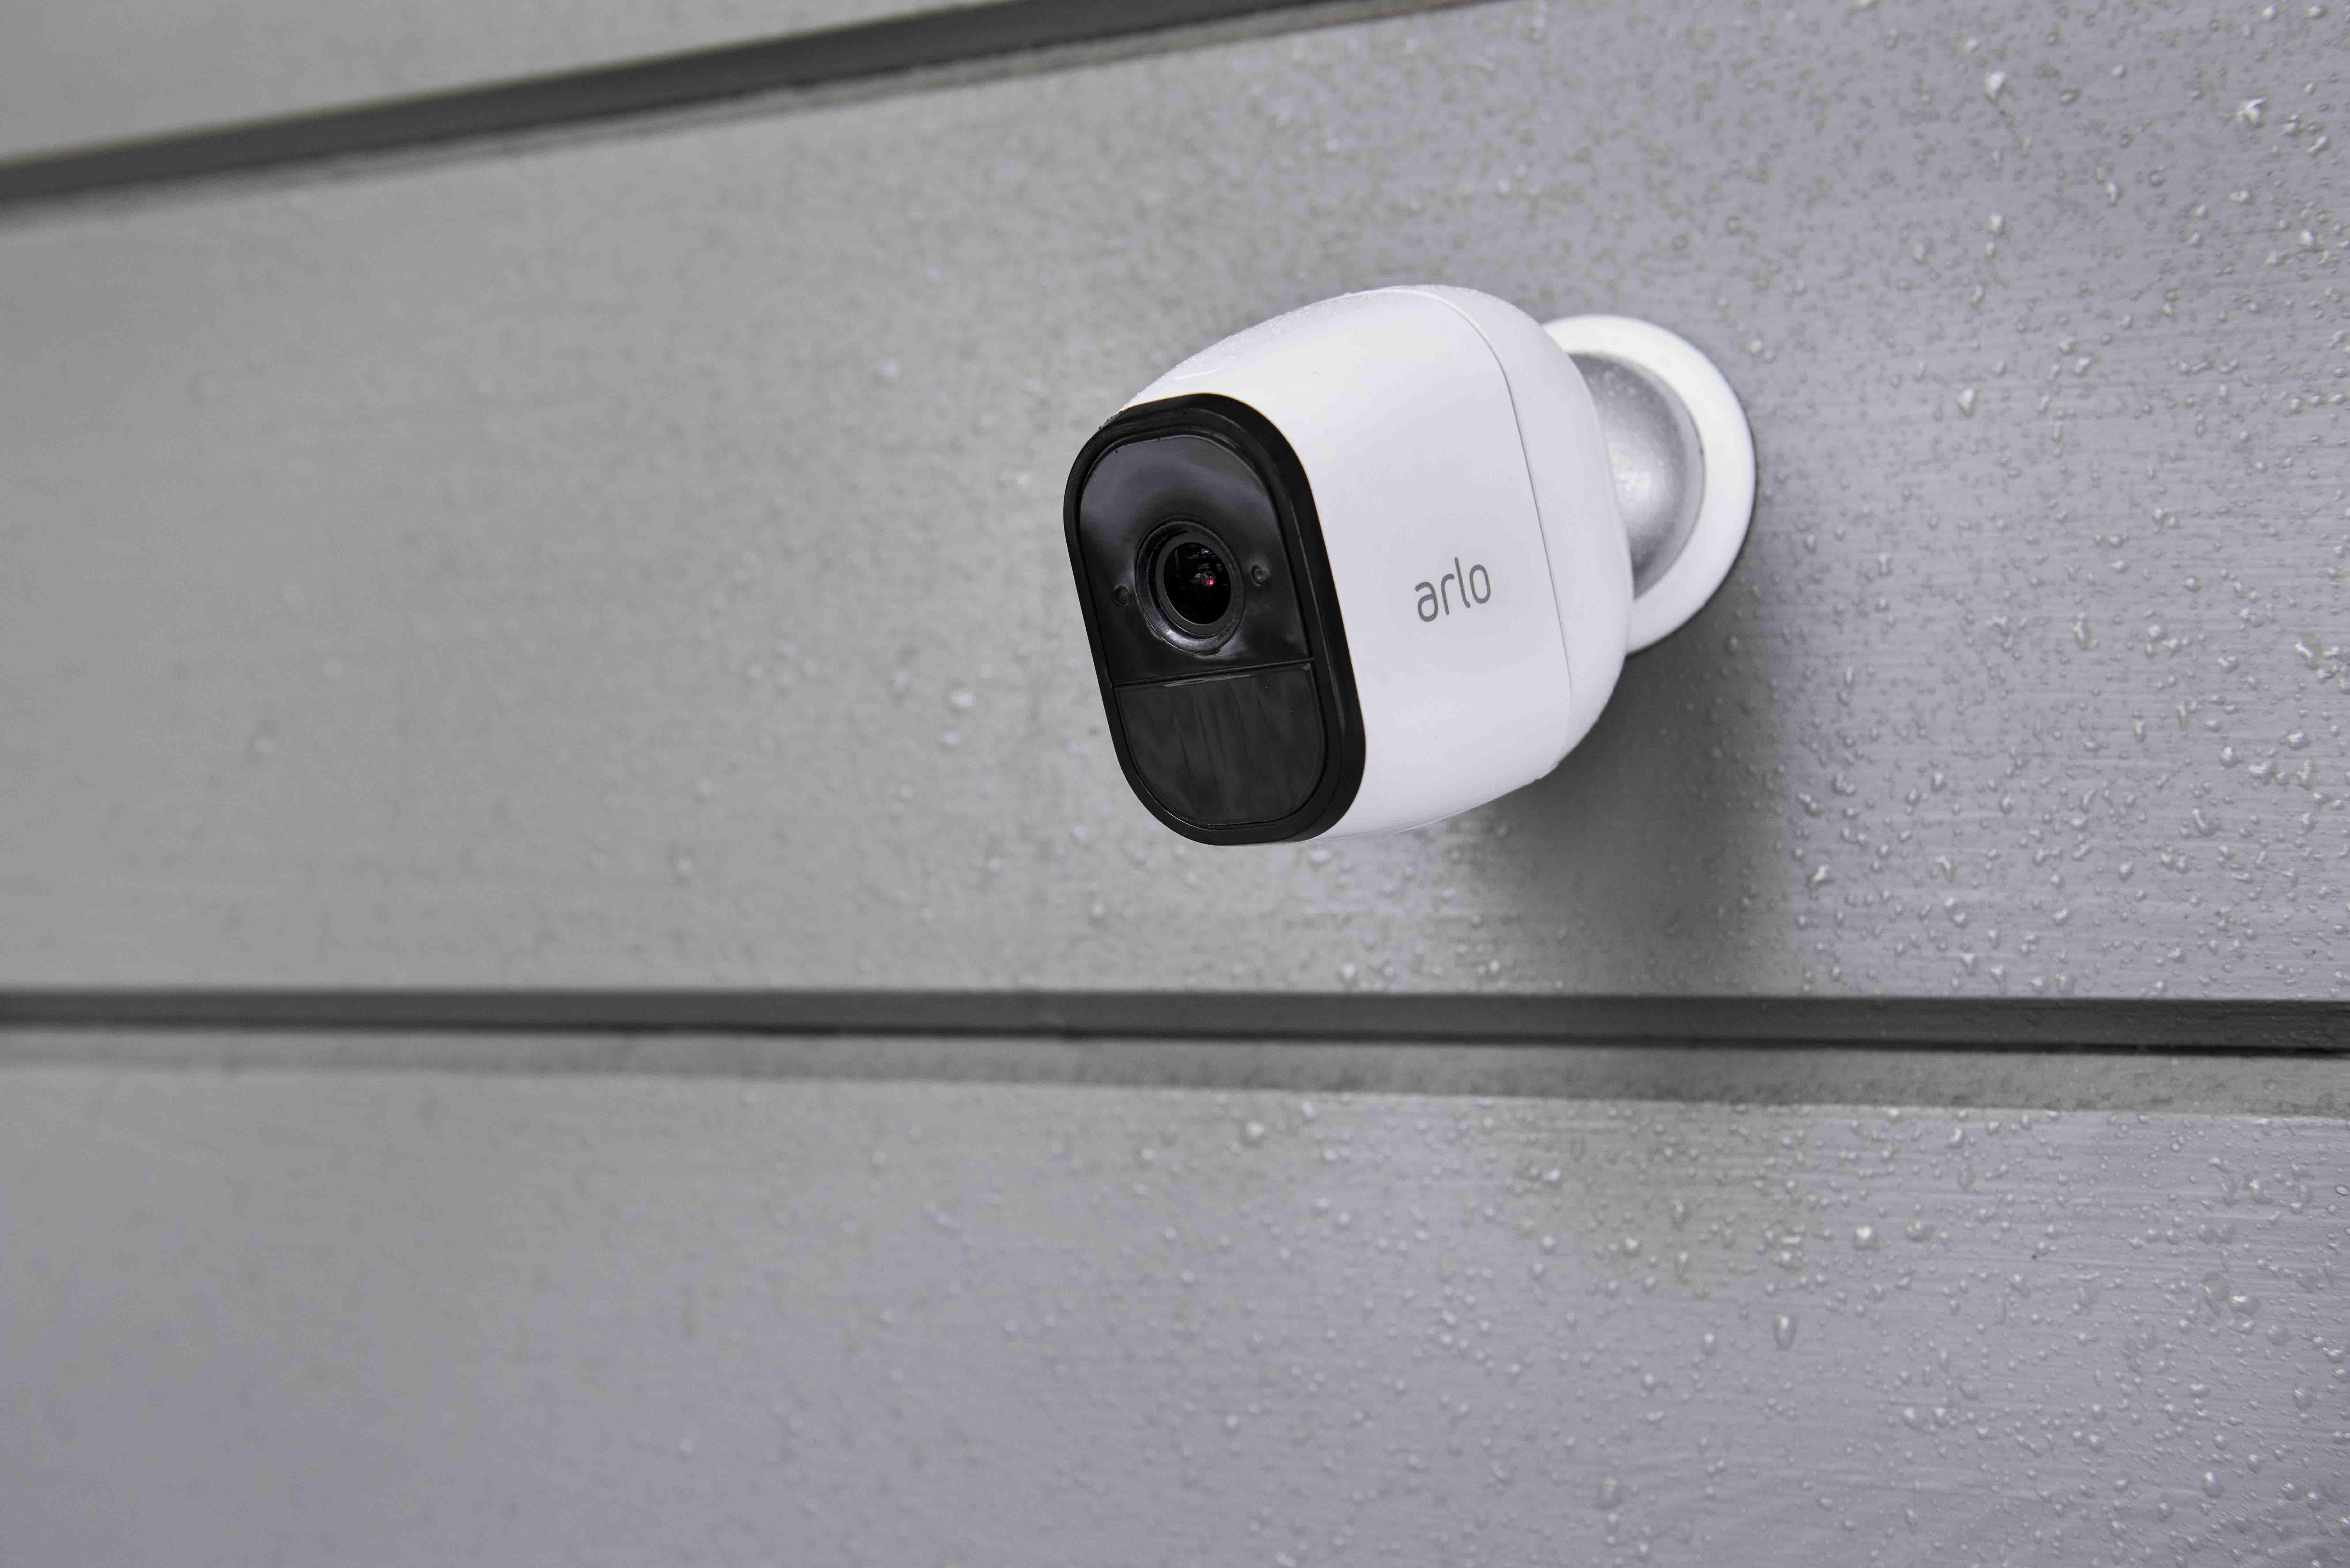 Netgear Claims Its New Wireless Security Camera Lasts Six